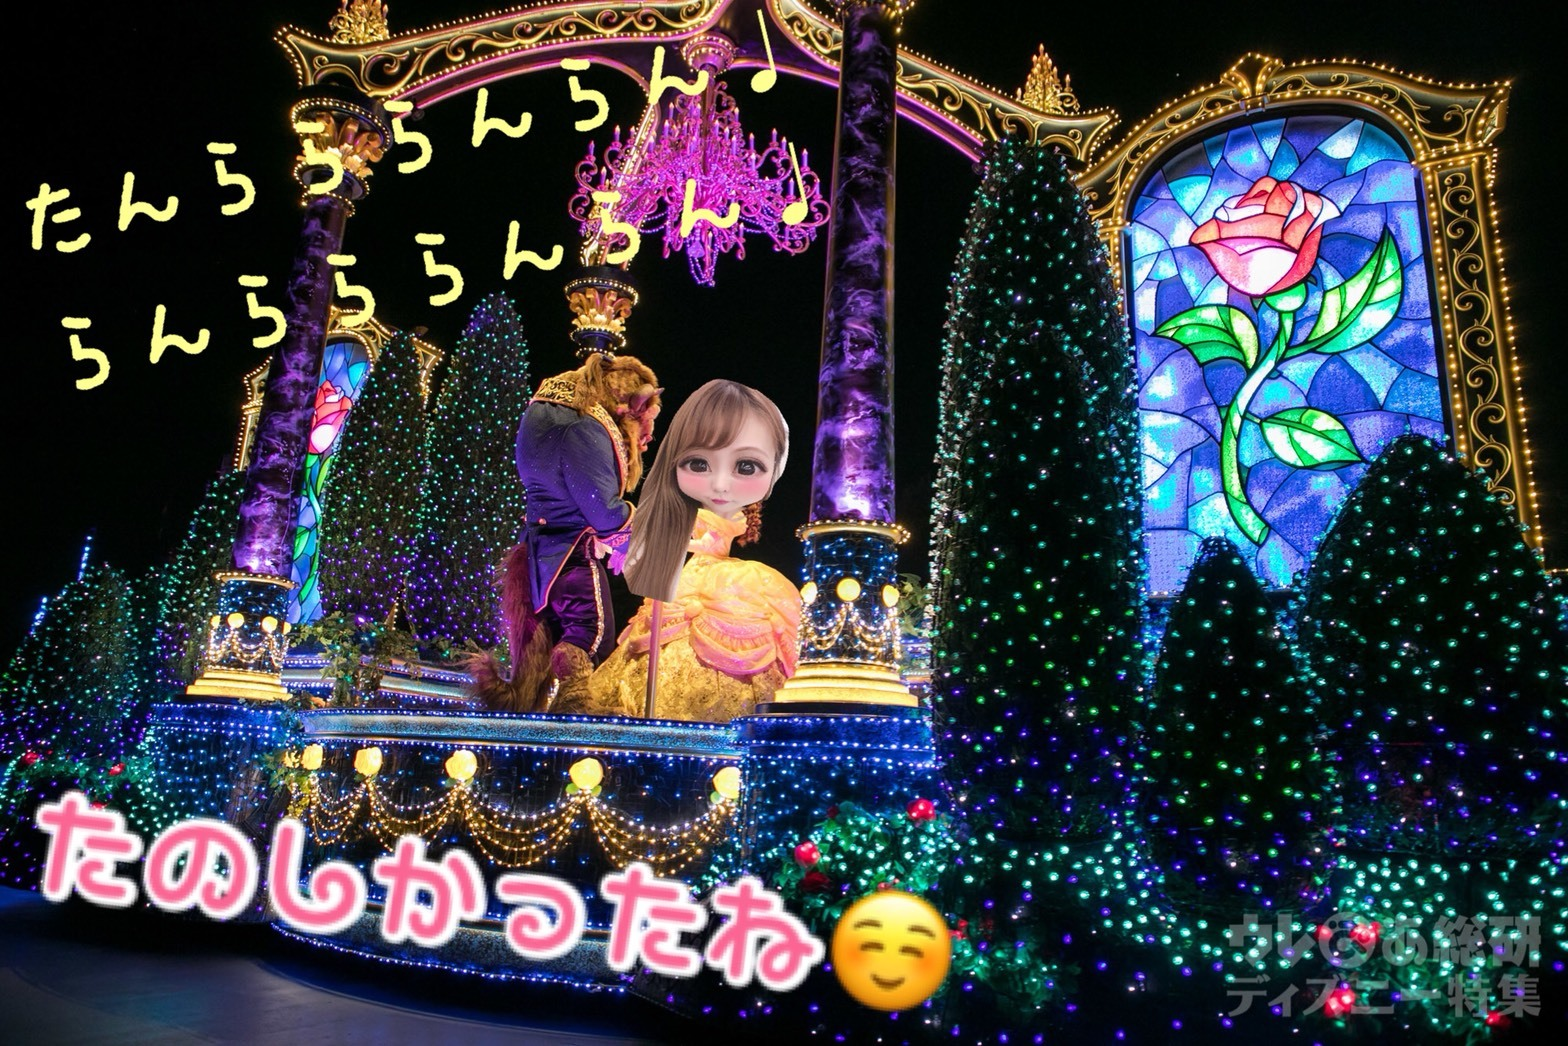 S__16859142.jpg